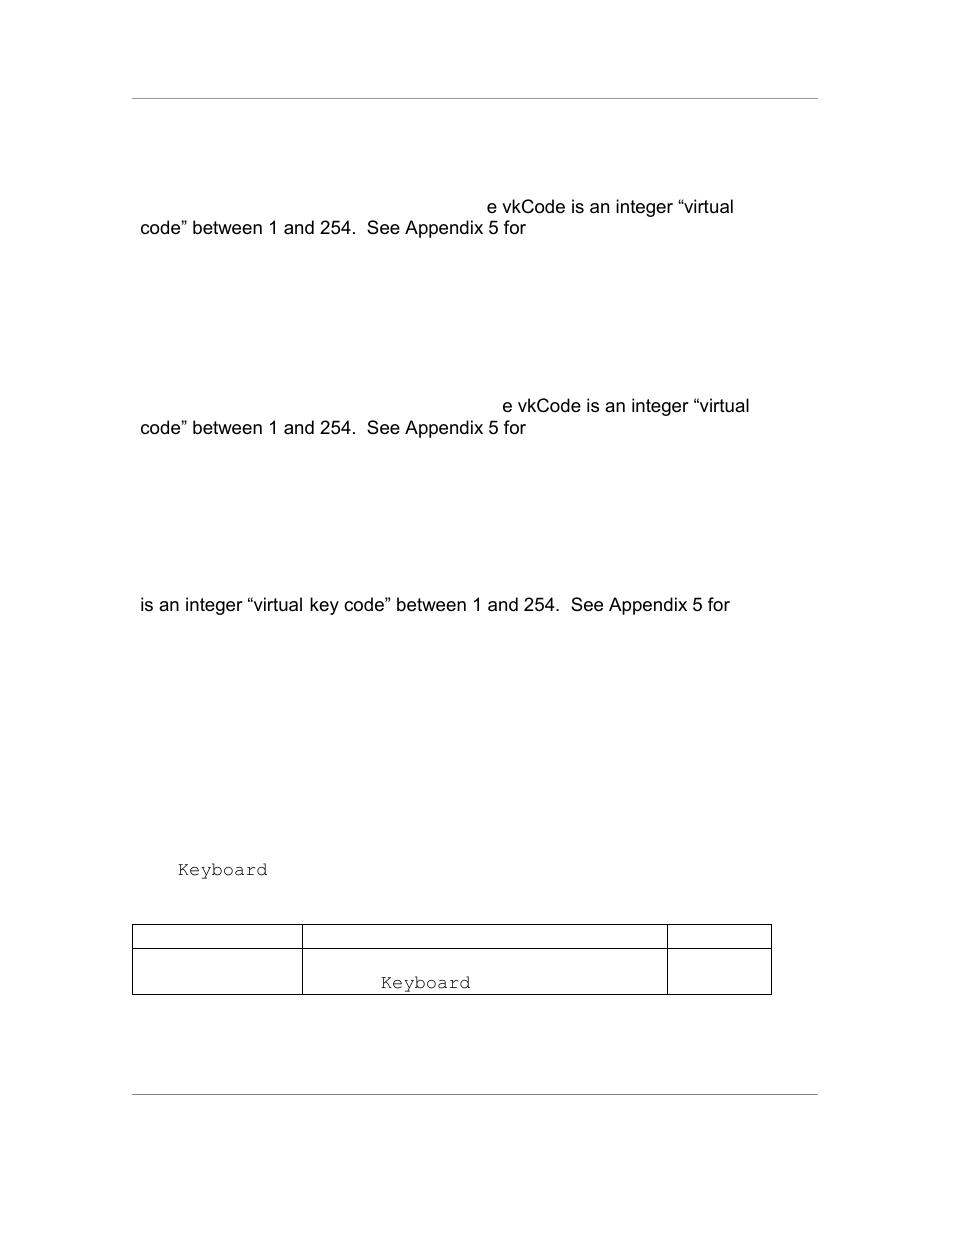 Properties, Status = simulatekeydown ( vkcode ), Status